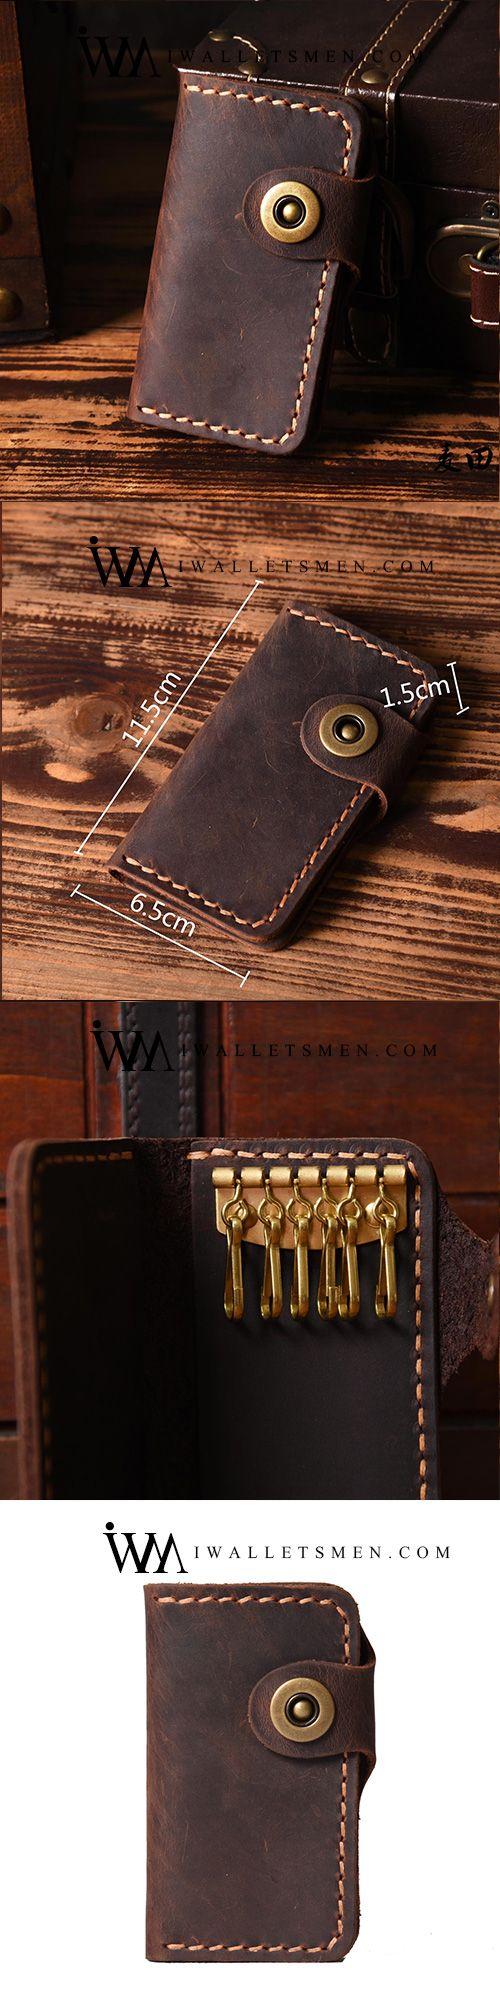 Handmade Leather Mens Cool Key Wallet Key Holder Car Key Case for Men